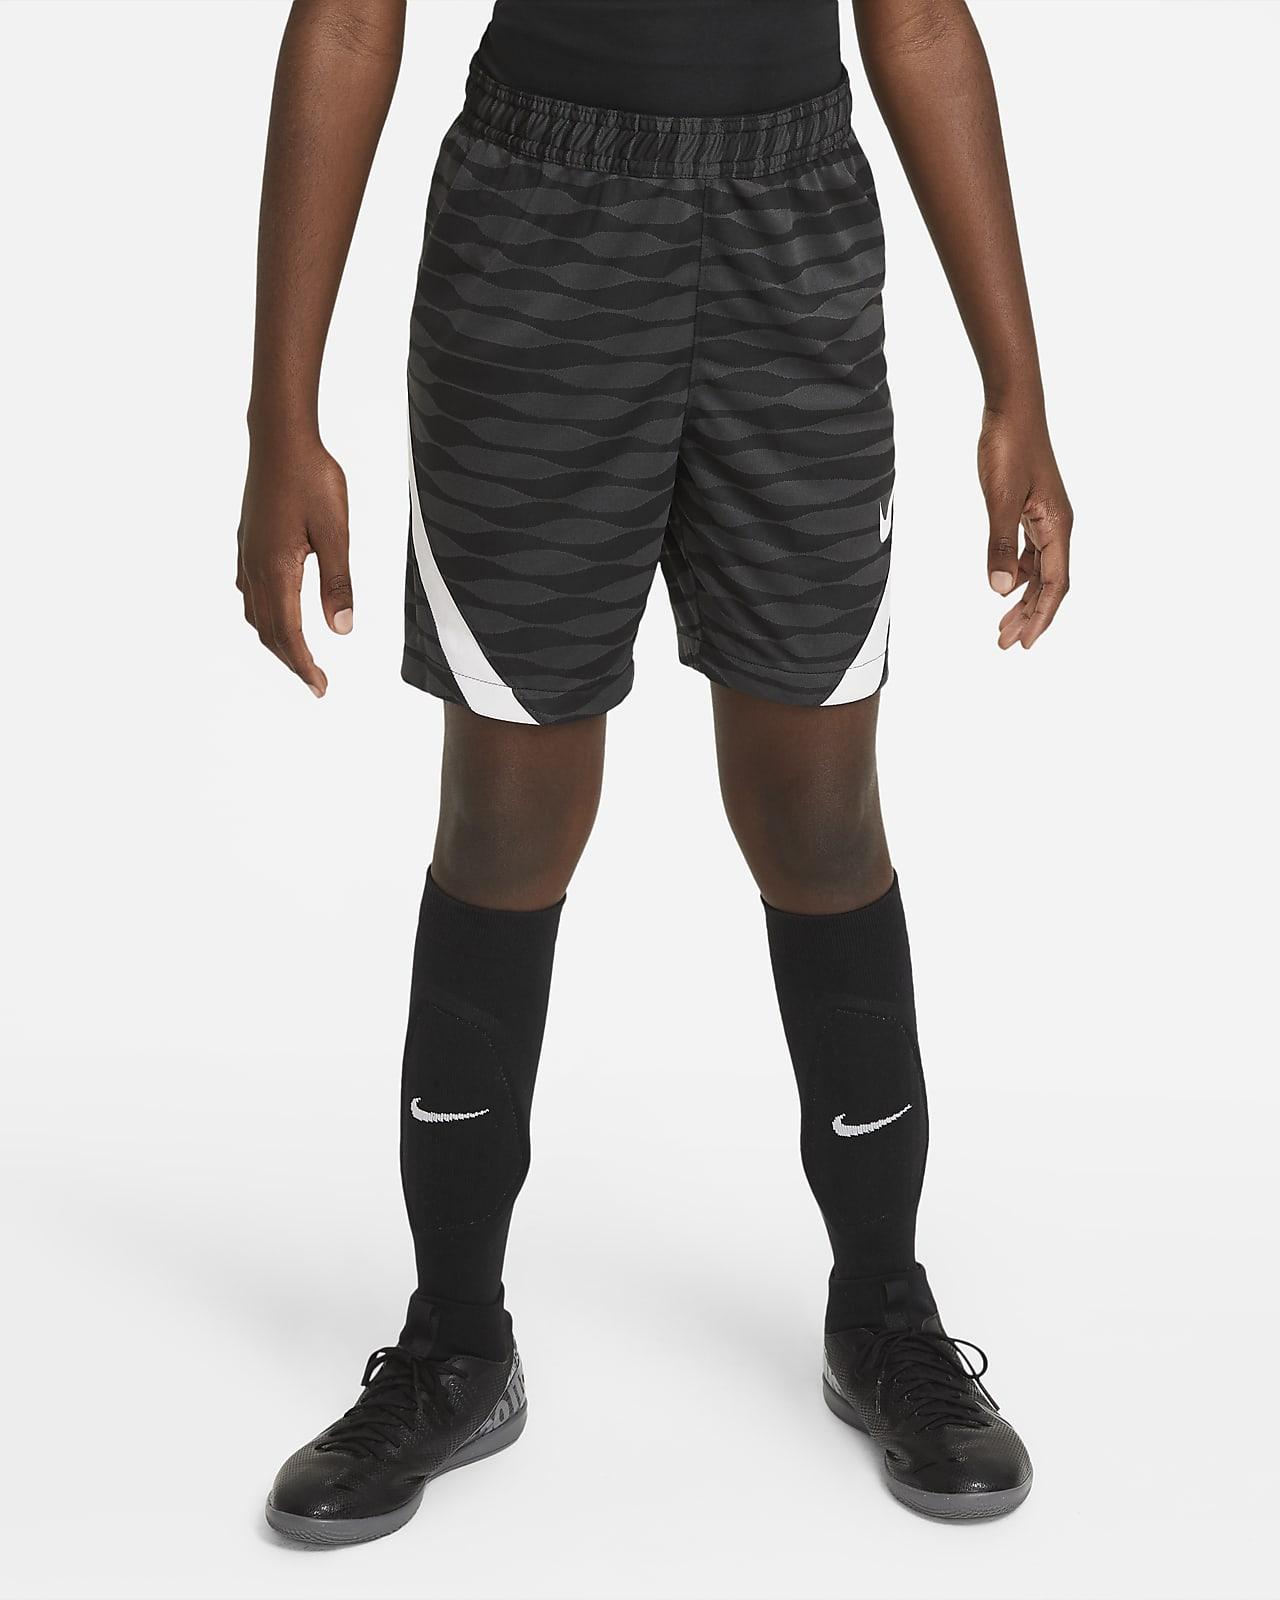 Shorts de fútbol tejidos para niños talla grande Nike Dri-FIT Strike